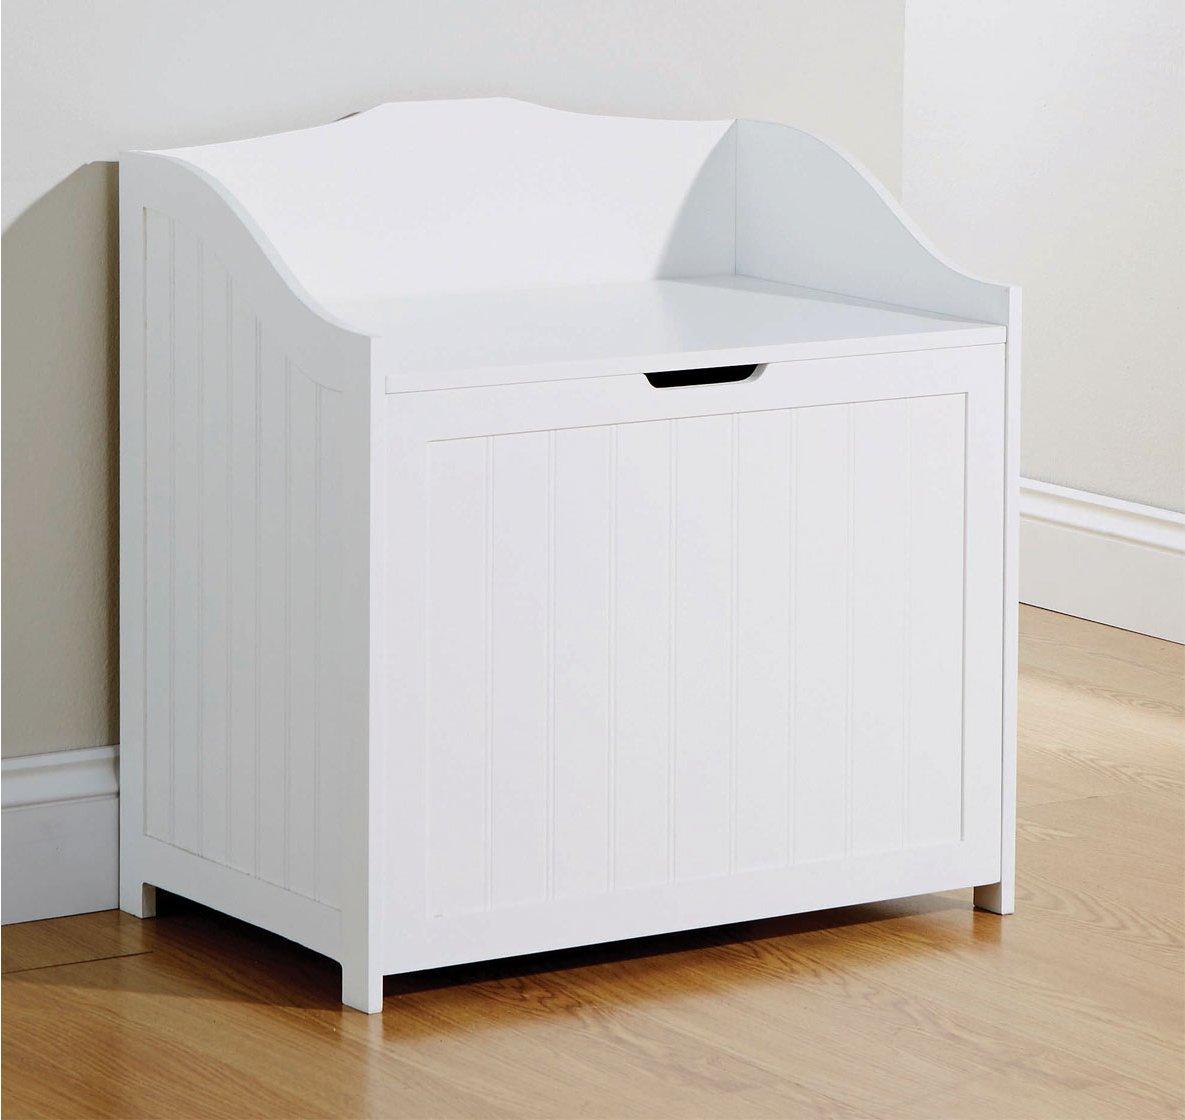 Valufurniture 57019 Cabinets